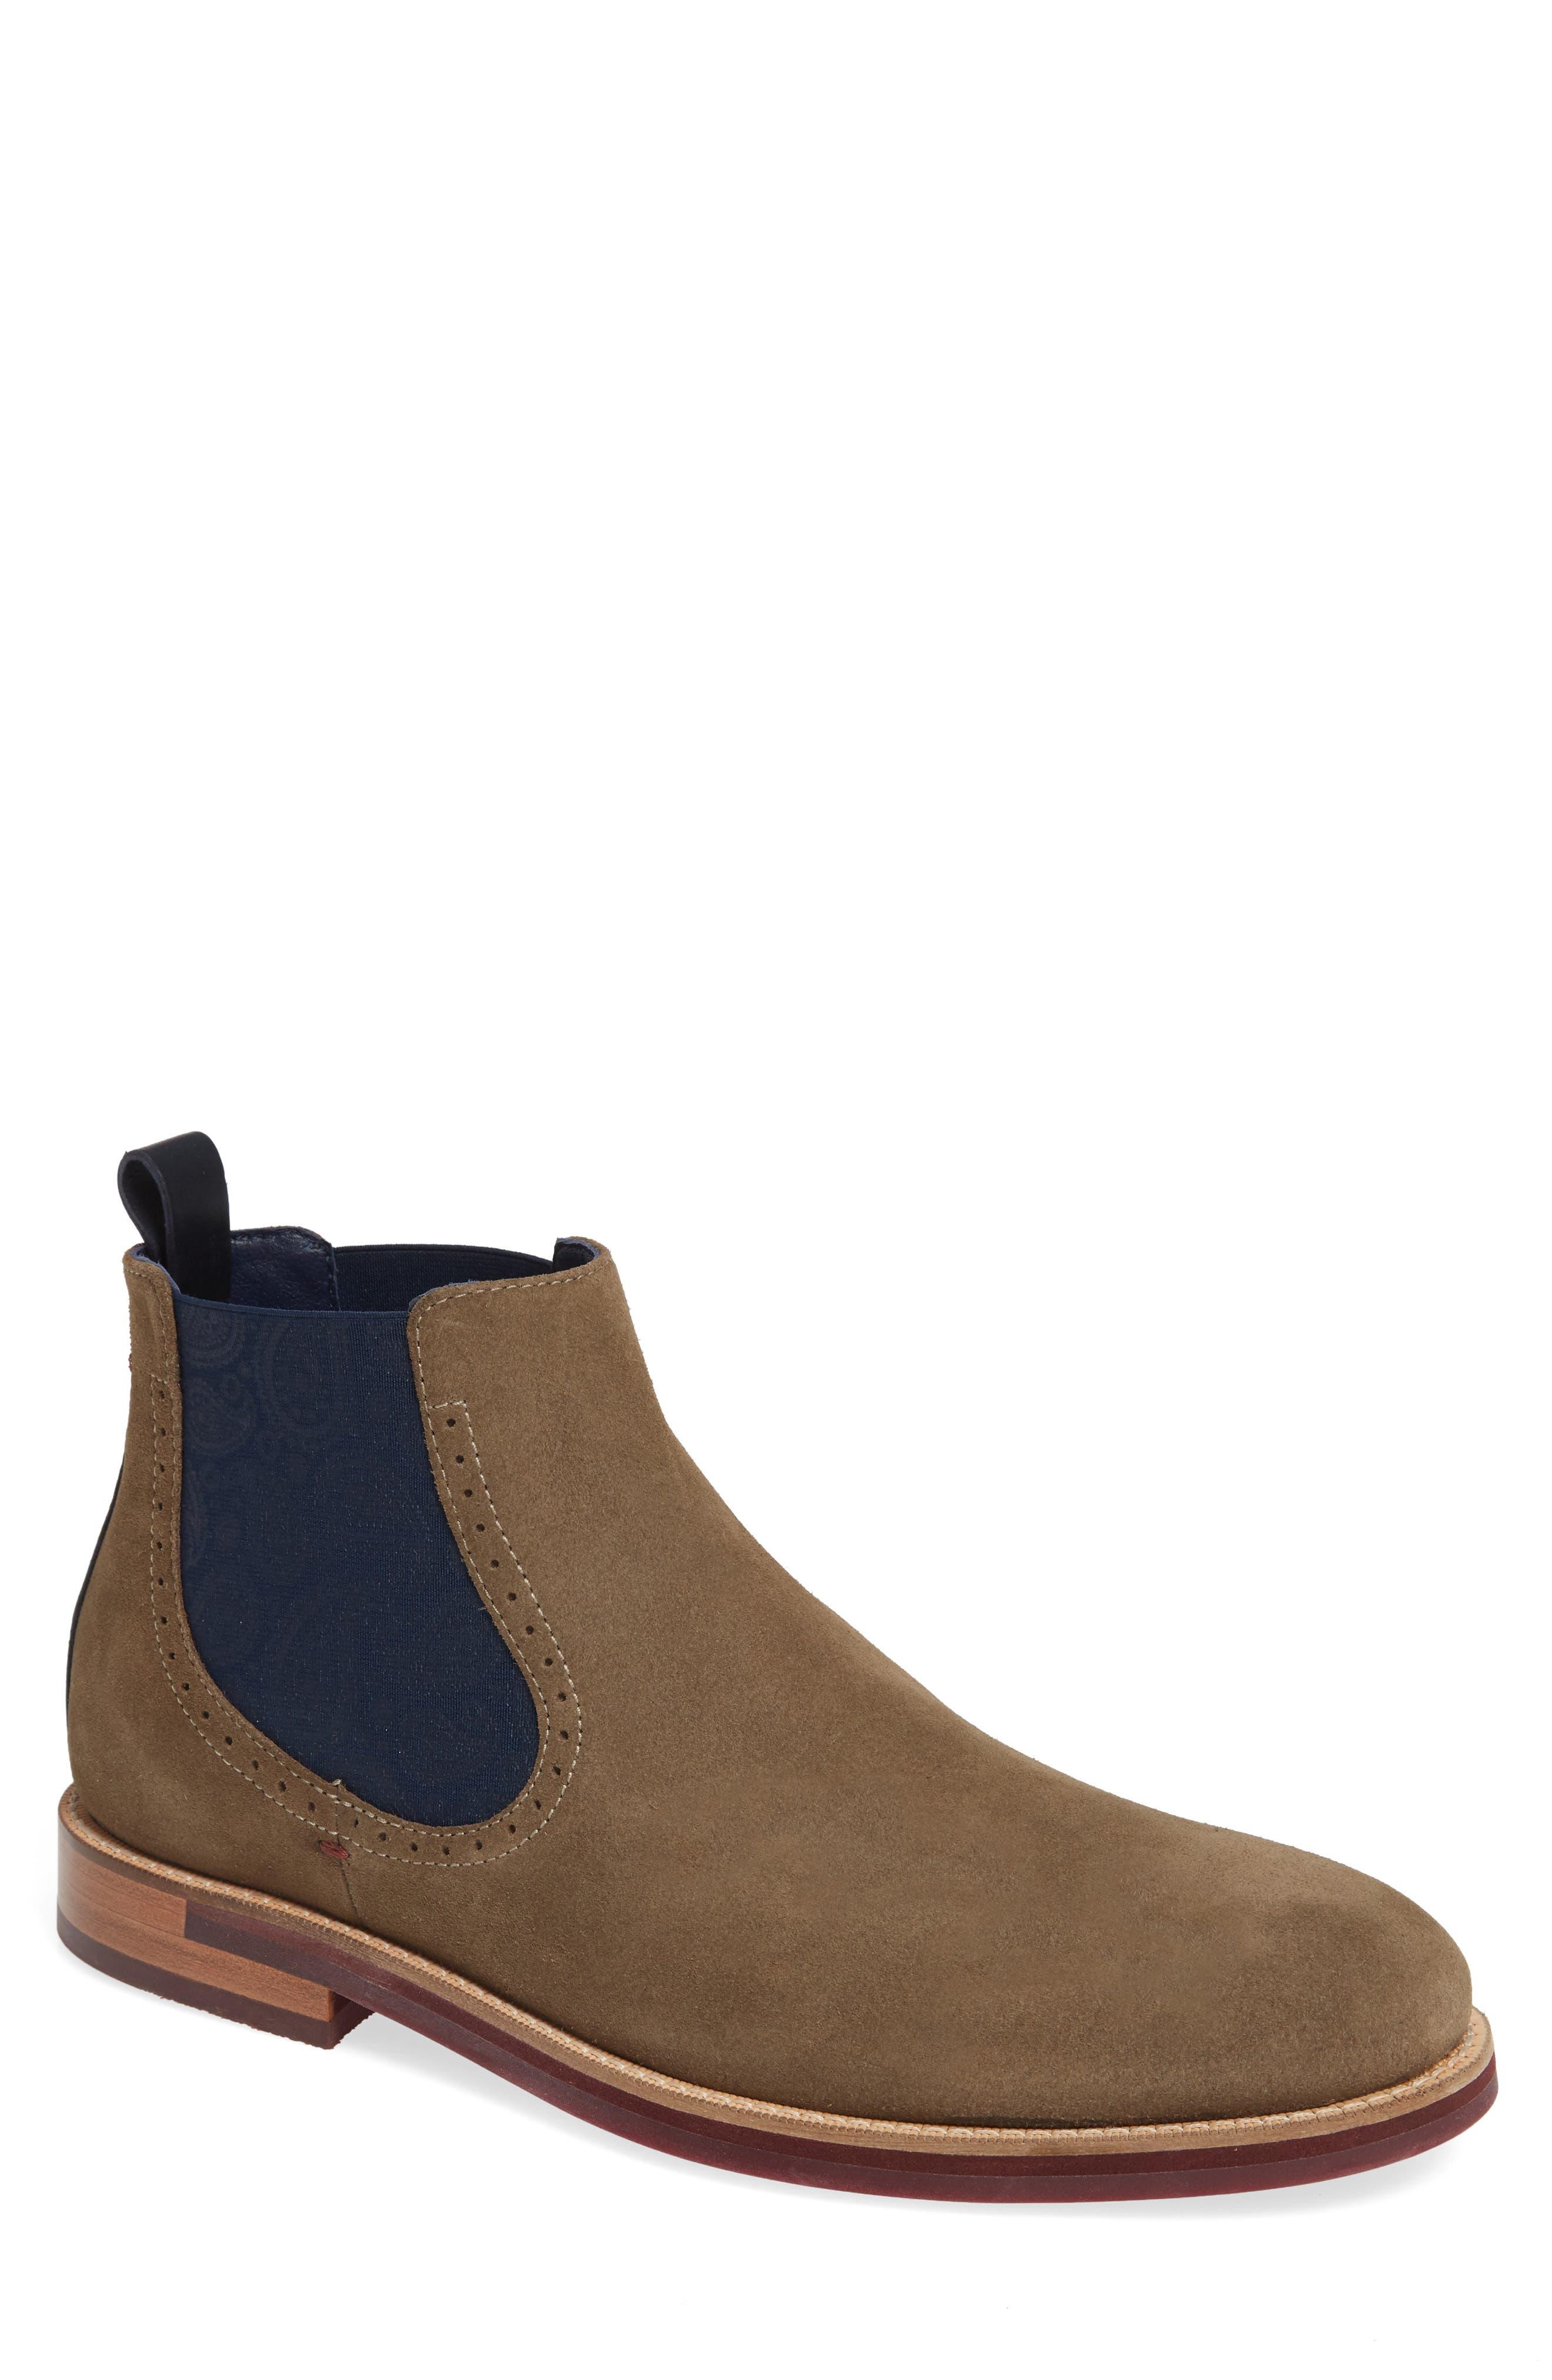 Ted Baker London Secaint Chelsea Boot, Grey